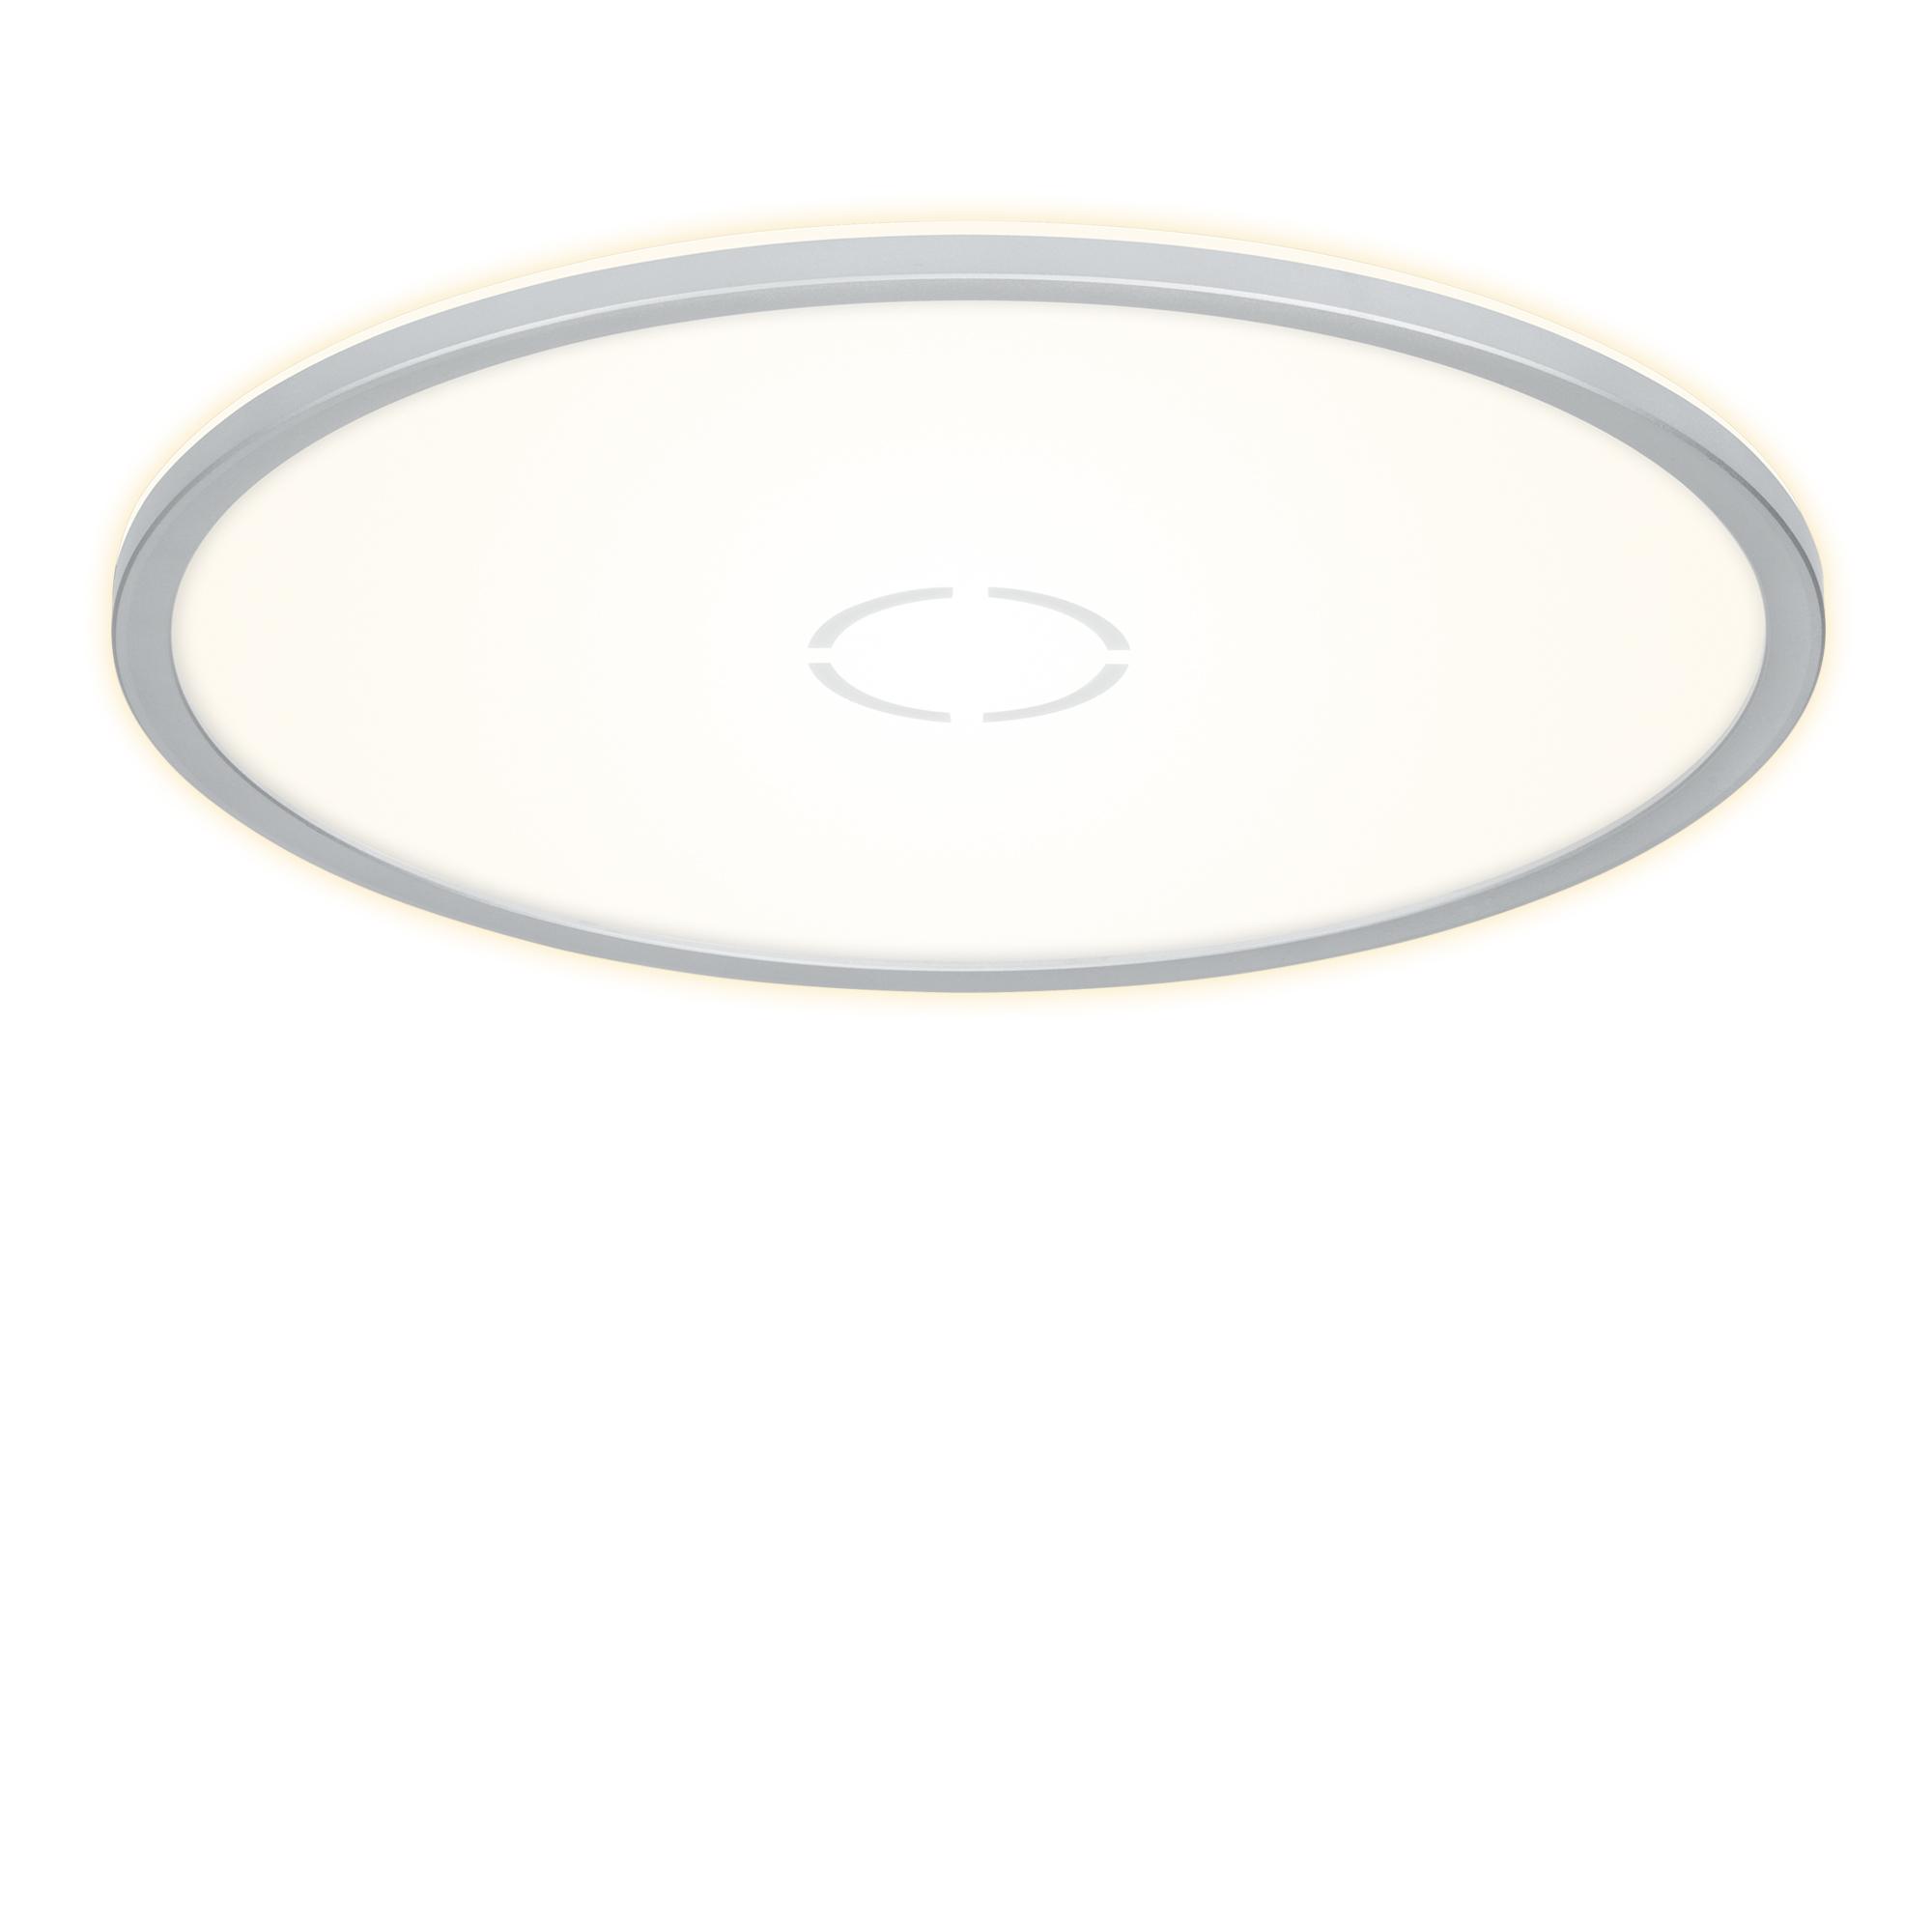 Slim LED Panel, Ø 42 cm, 3000 LUMEN, 22 WATT, Silber